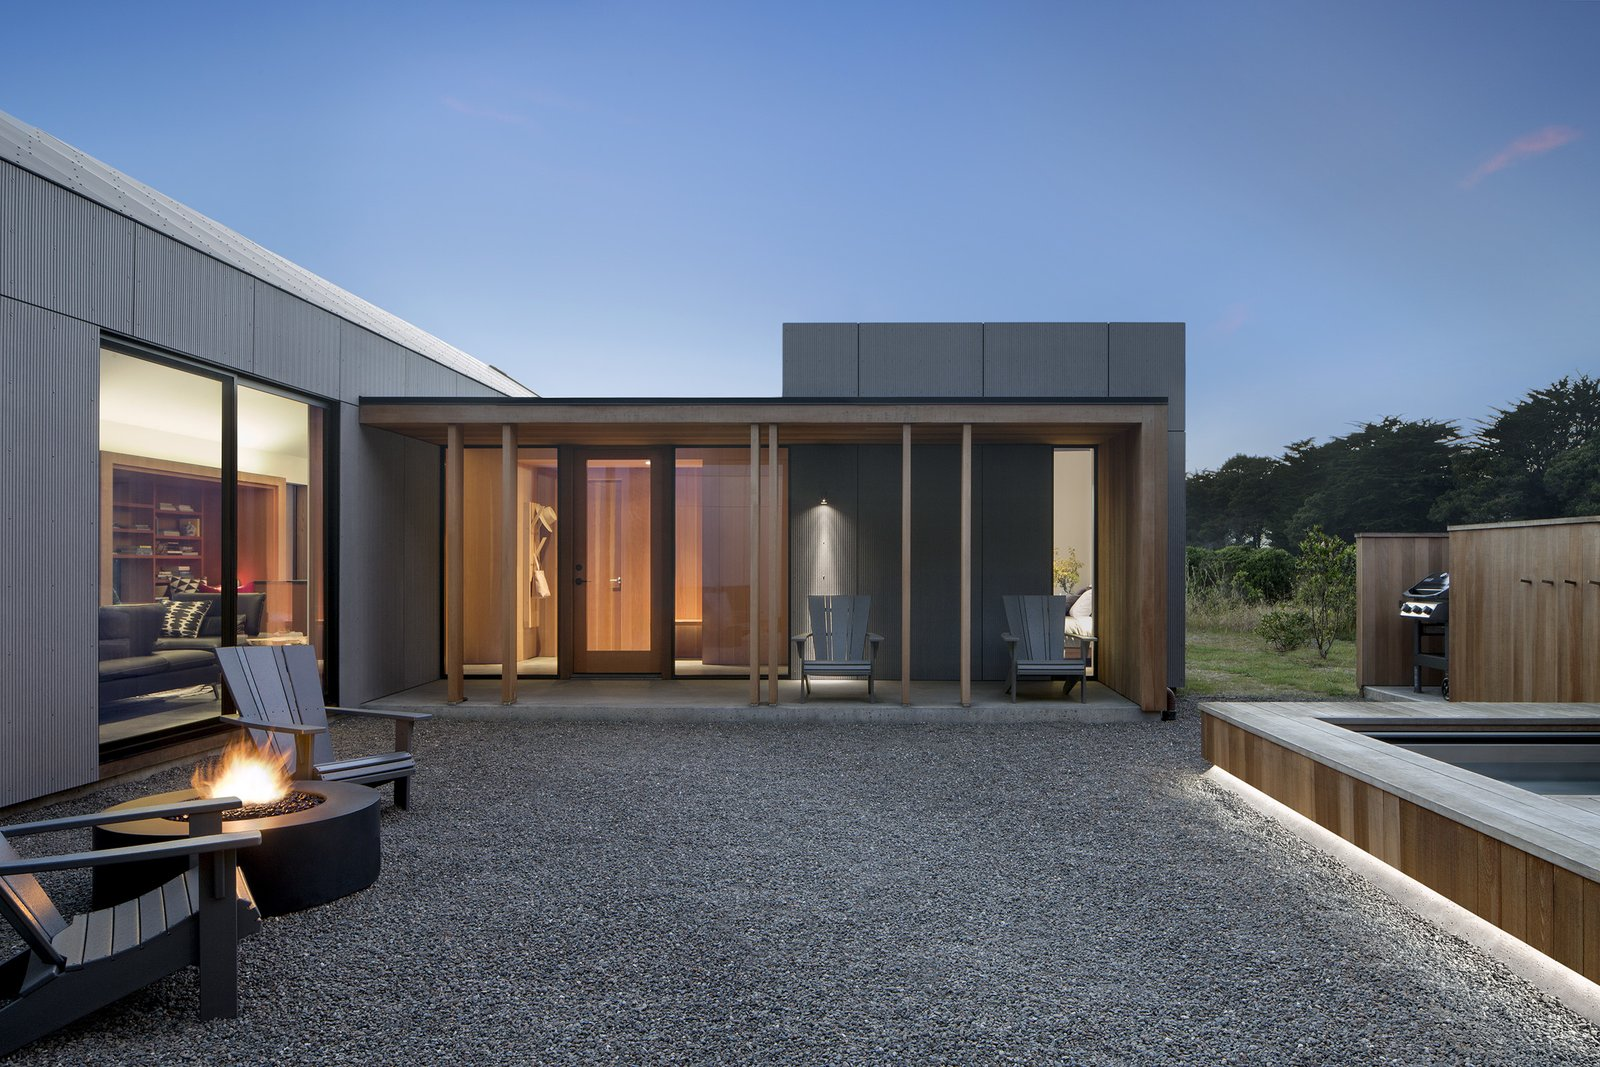 Skyfall Residence by Turnbull Griffin Haesloop Courtyard